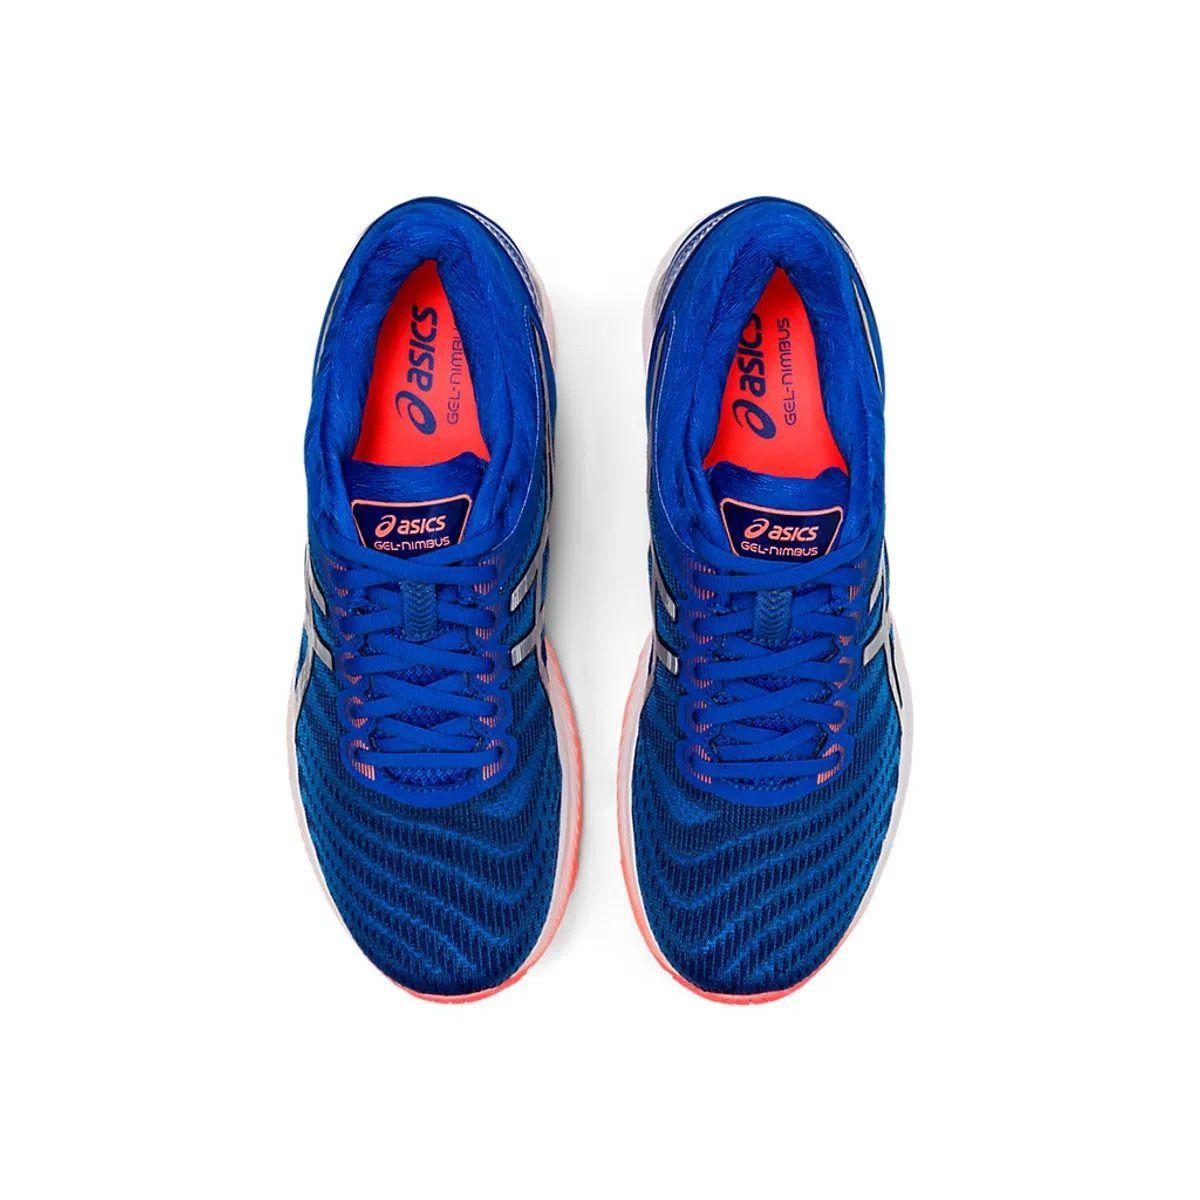 Tênis Asics Gel Nimbus 22 Masculino Azul e Laranja